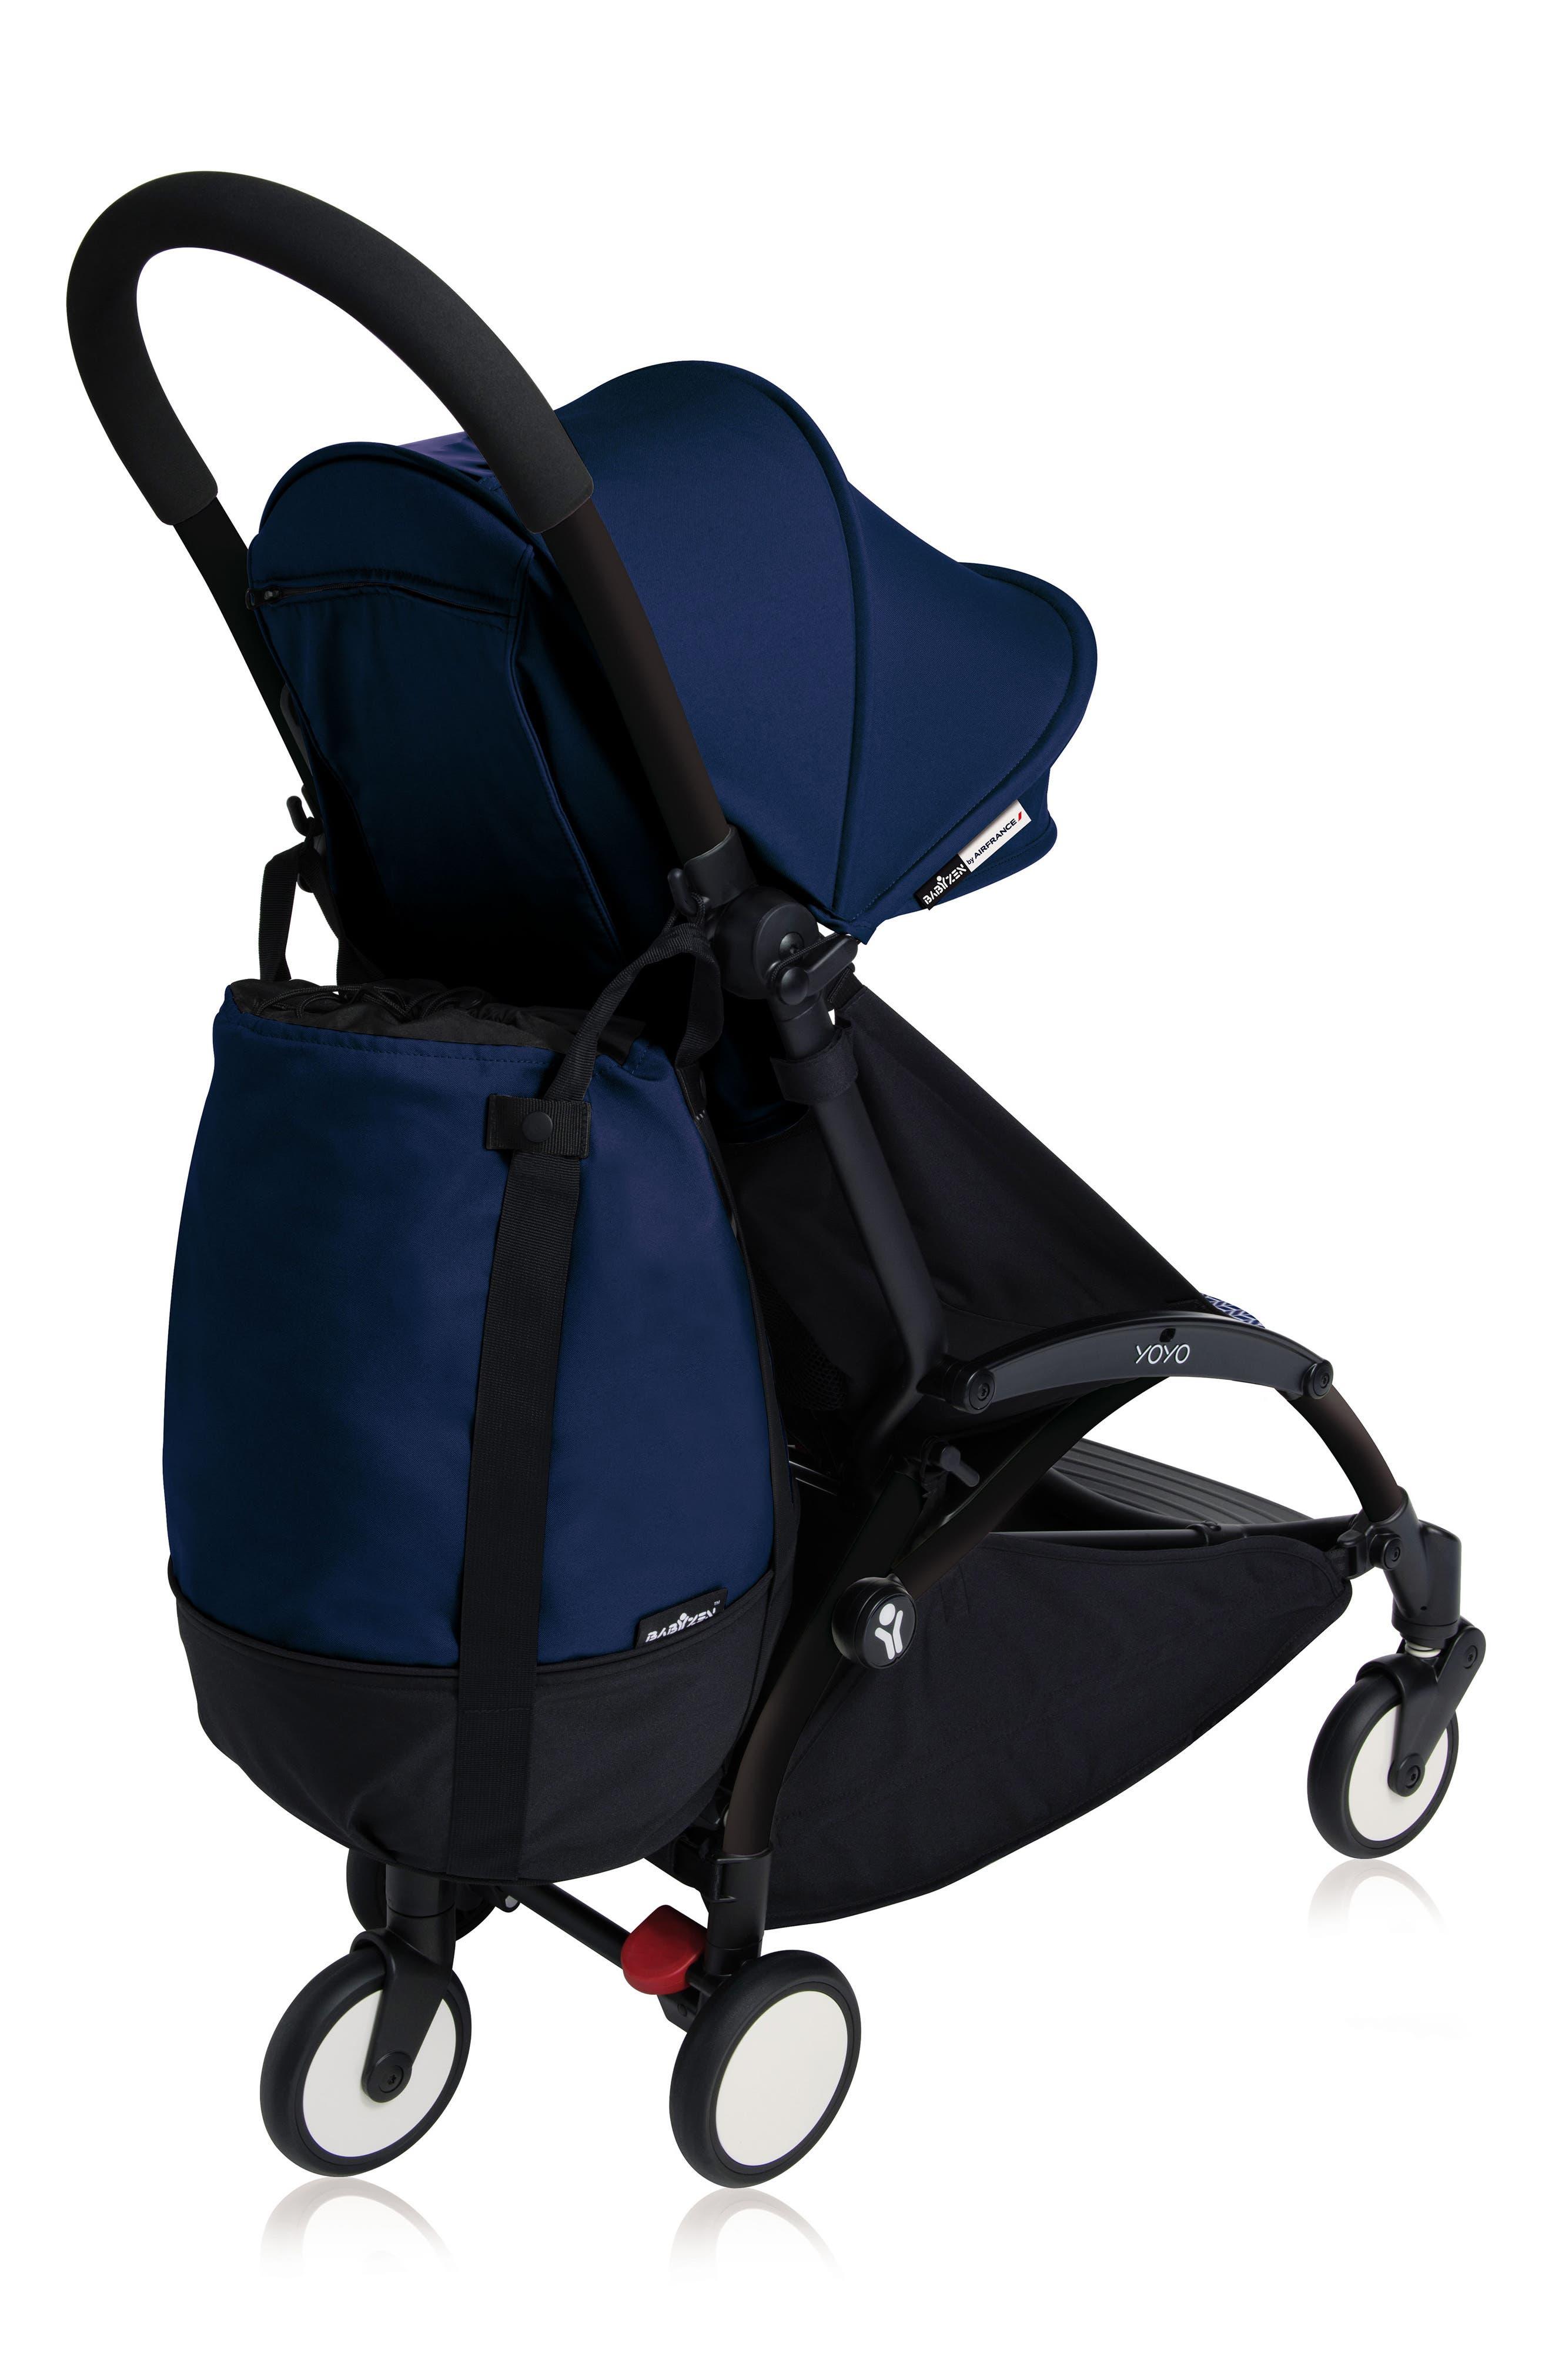 Infant Babyzen(TM) Yoyo Rolling Stroller Bag Size One Size  Blue